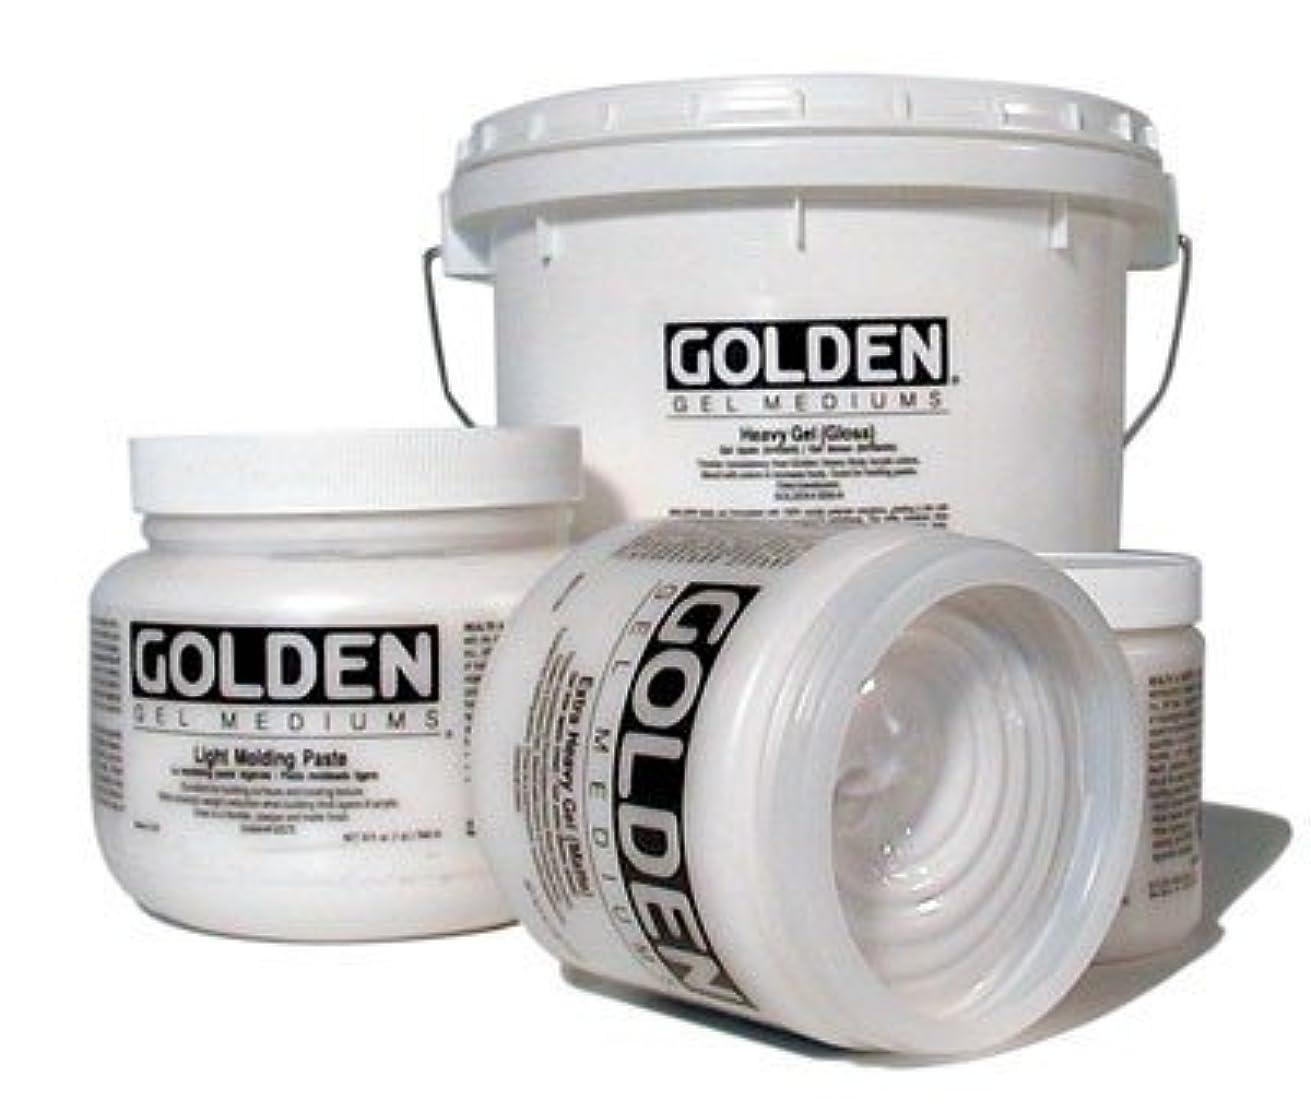 Golden Artist Colors - Light Molding Paste - 128 oz Jar